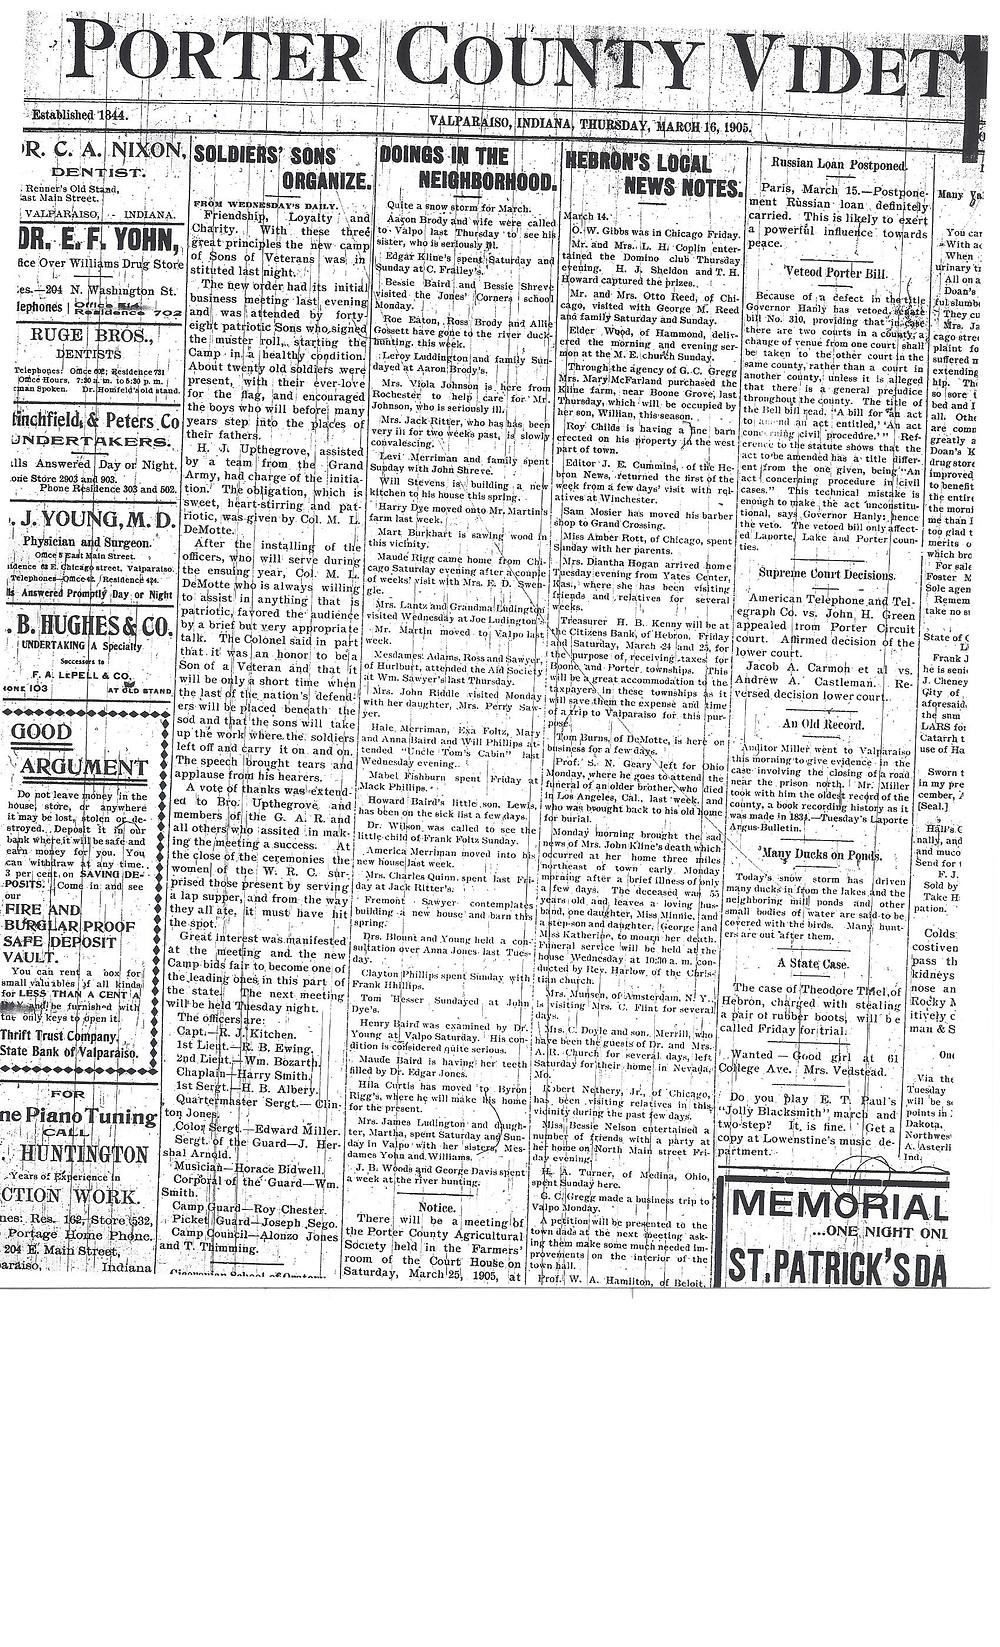 David D Porter Camp organized 1905